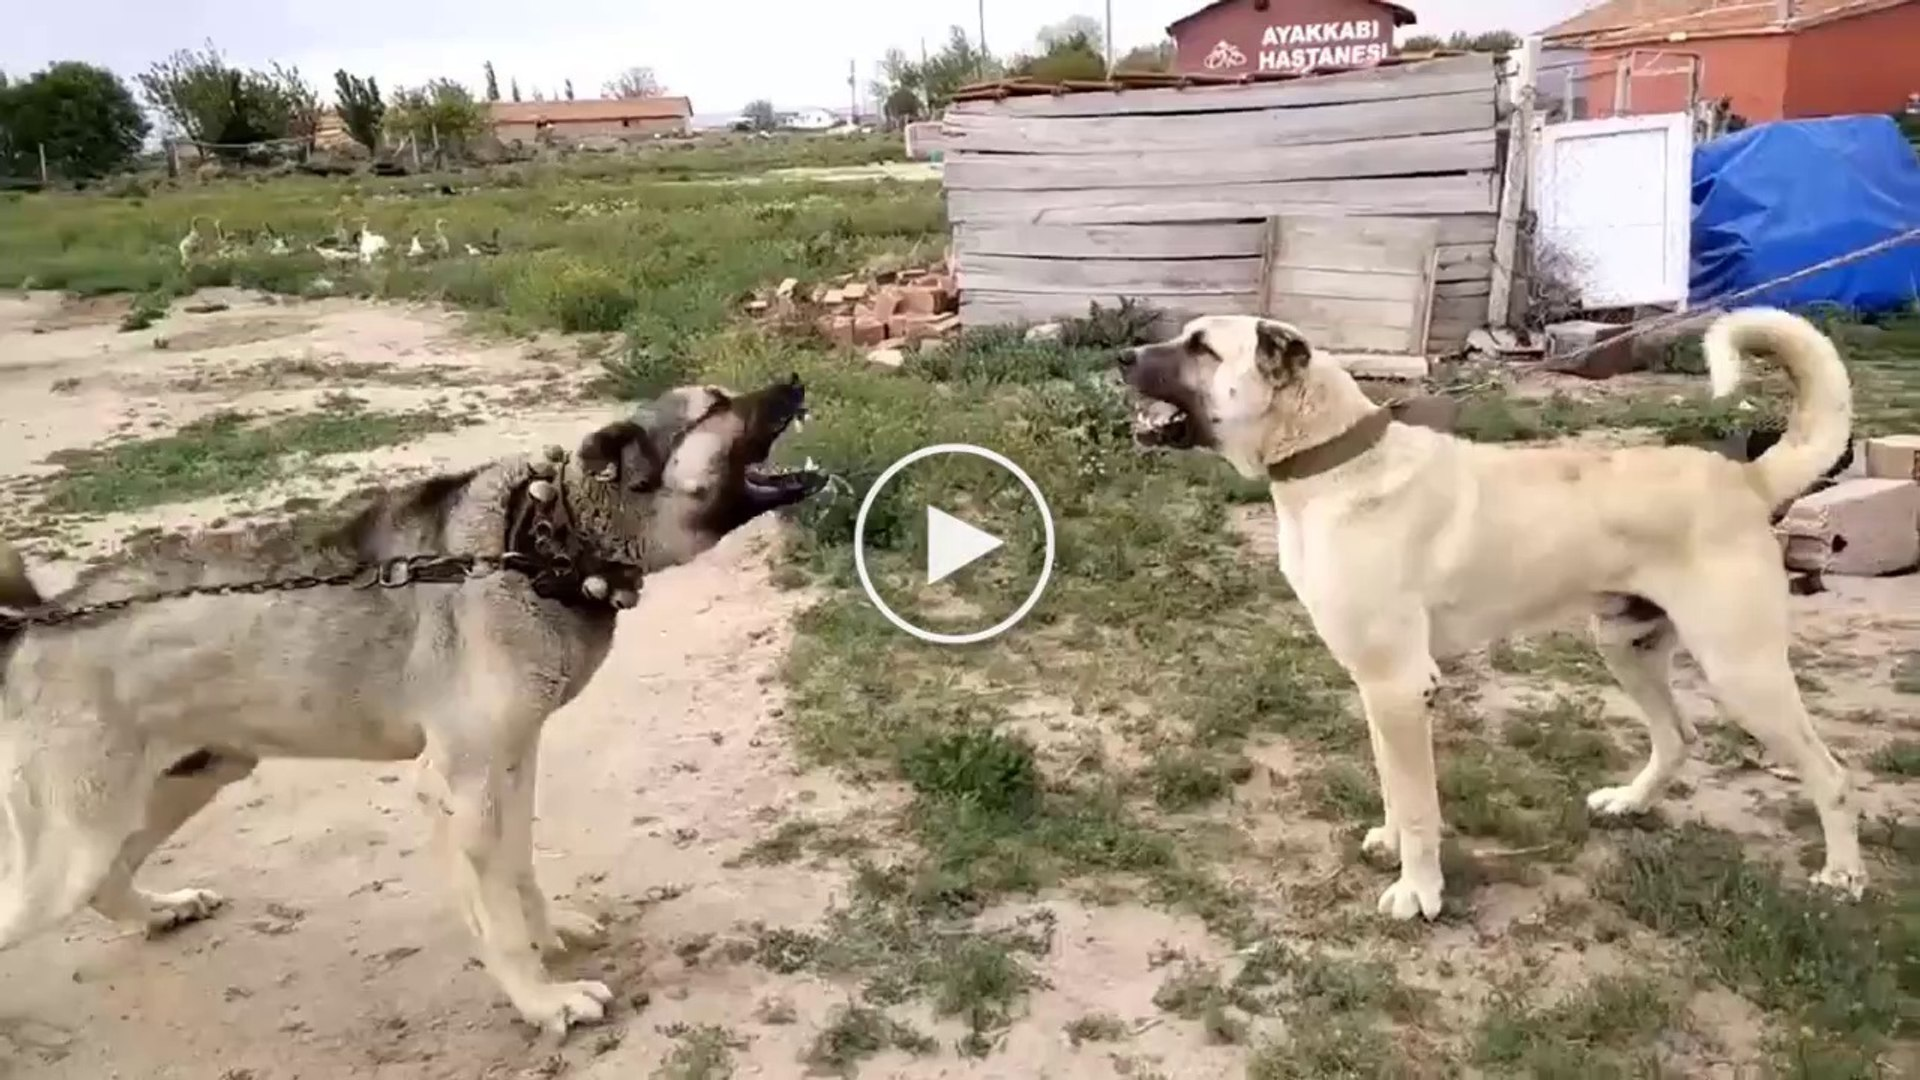 ANADOLU COBAN KOPEKLERi ATISMA - ANATOLiAN SHEPHERD DOGS VS